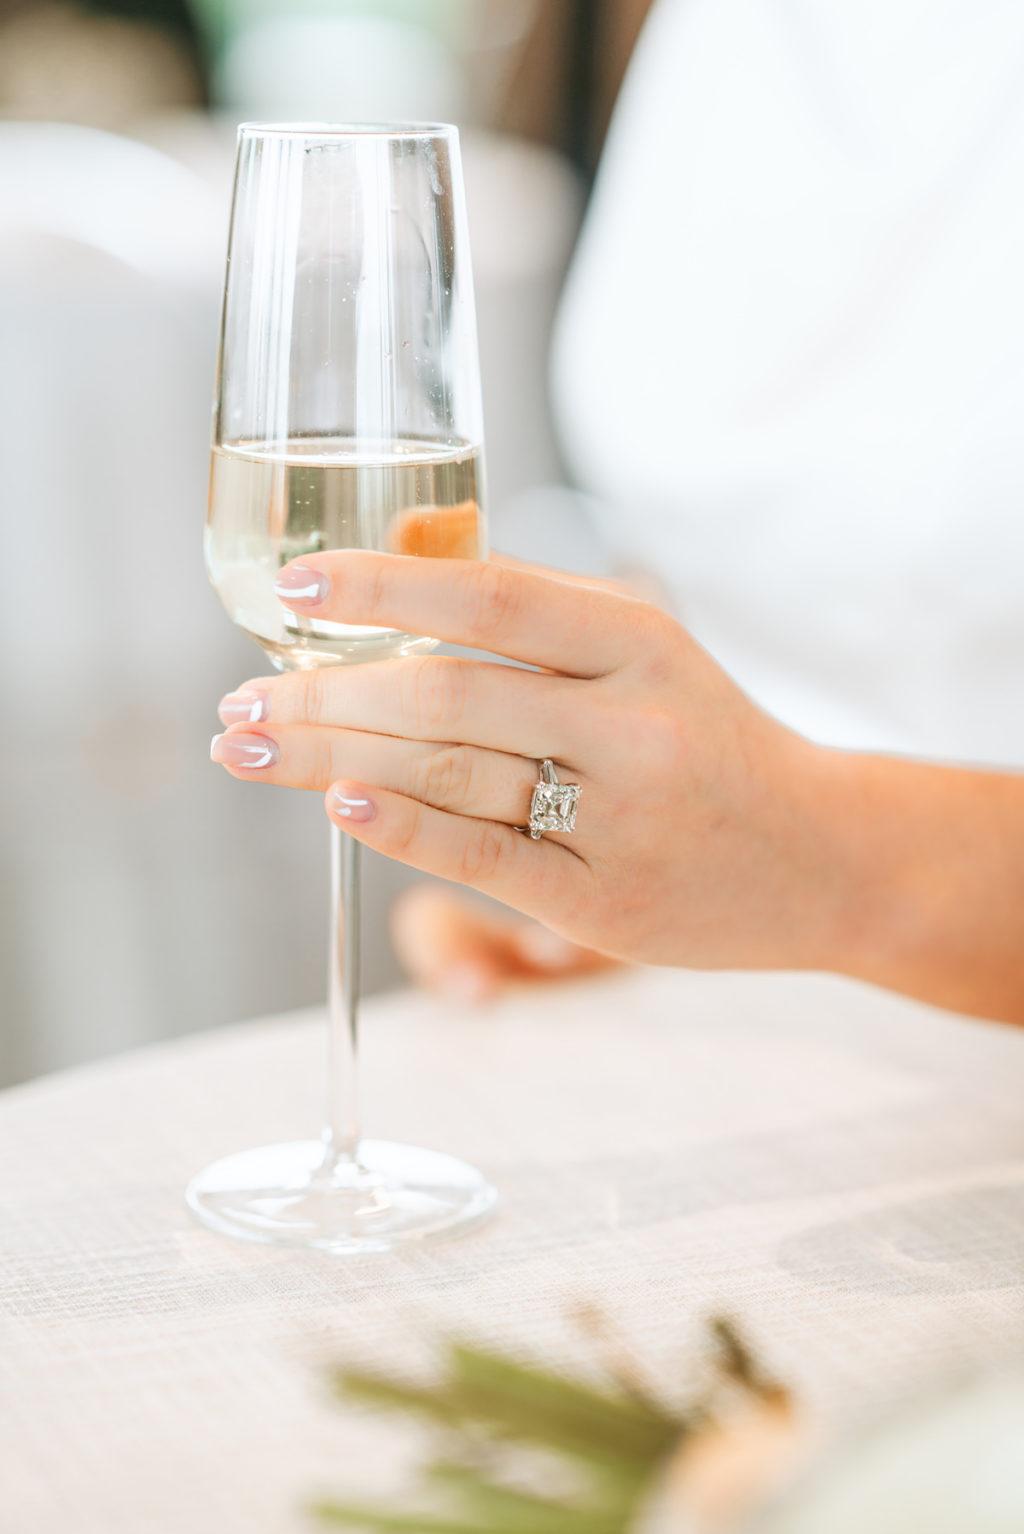 Bride Princess Cut Wedding Engagement Ring | Tampa Bay Jewelry Store International Diamond Center